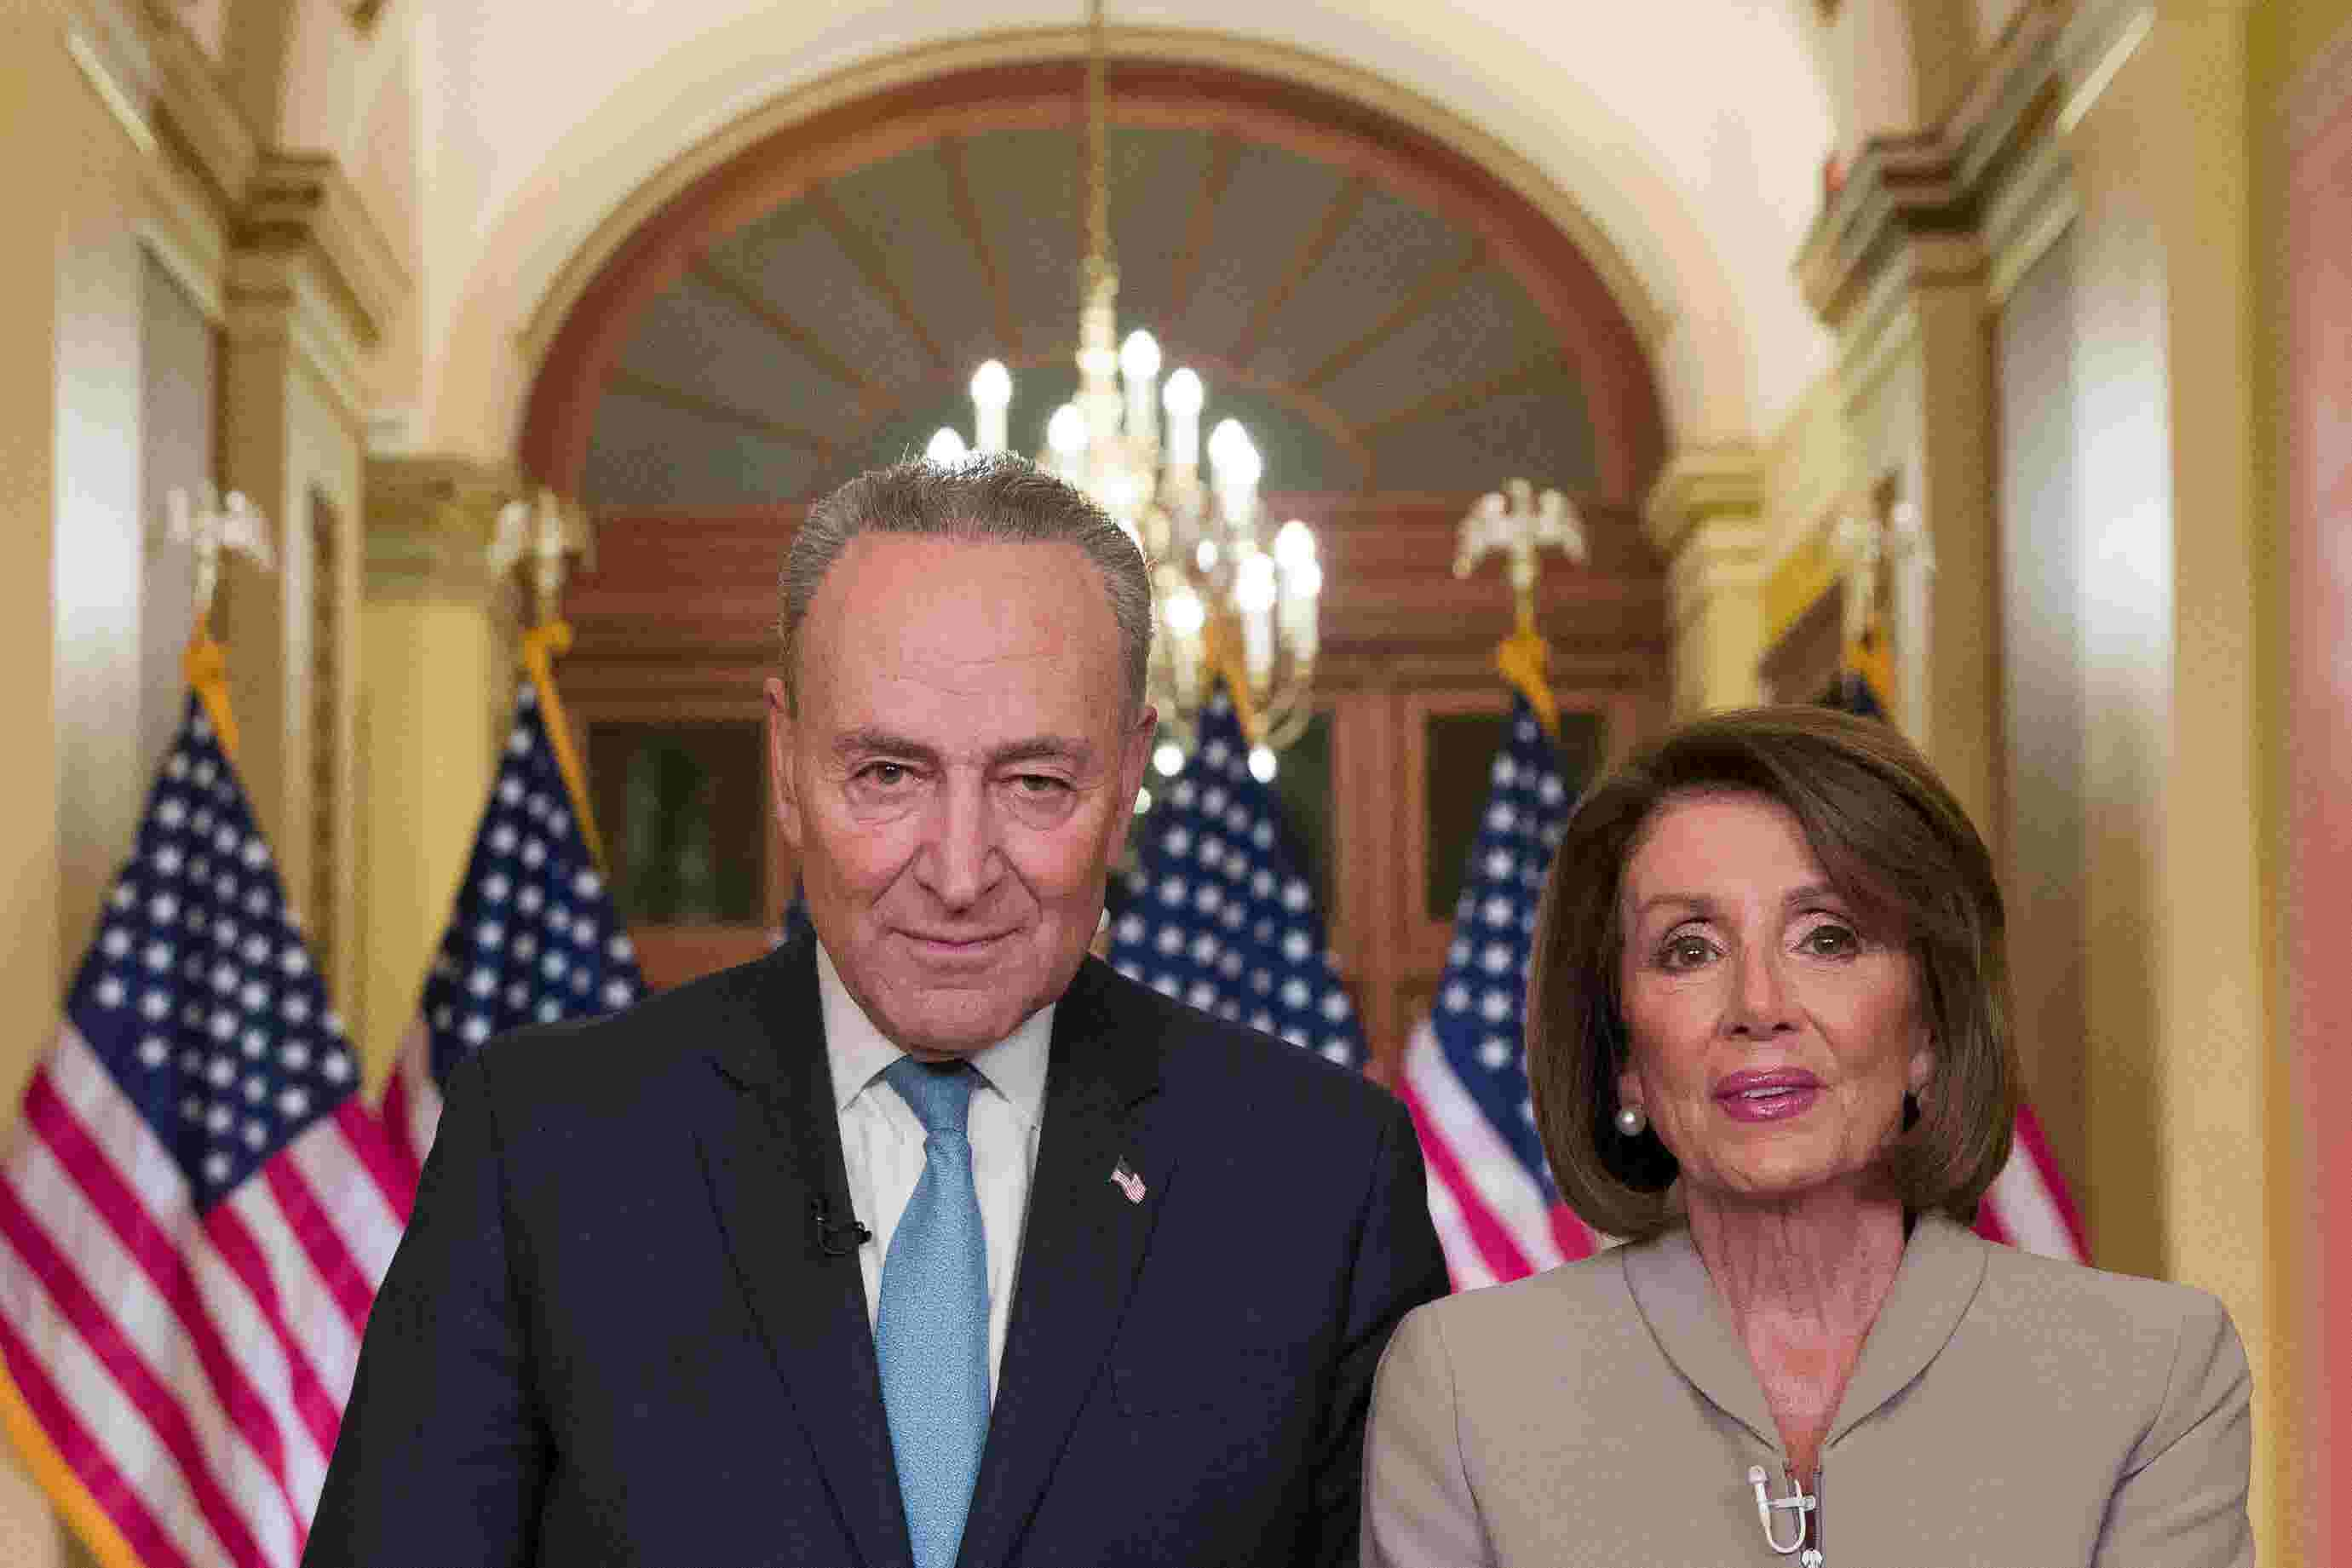 Trump Speech Twitter Jokes About Schumer Pelosi American Gothic Vibe